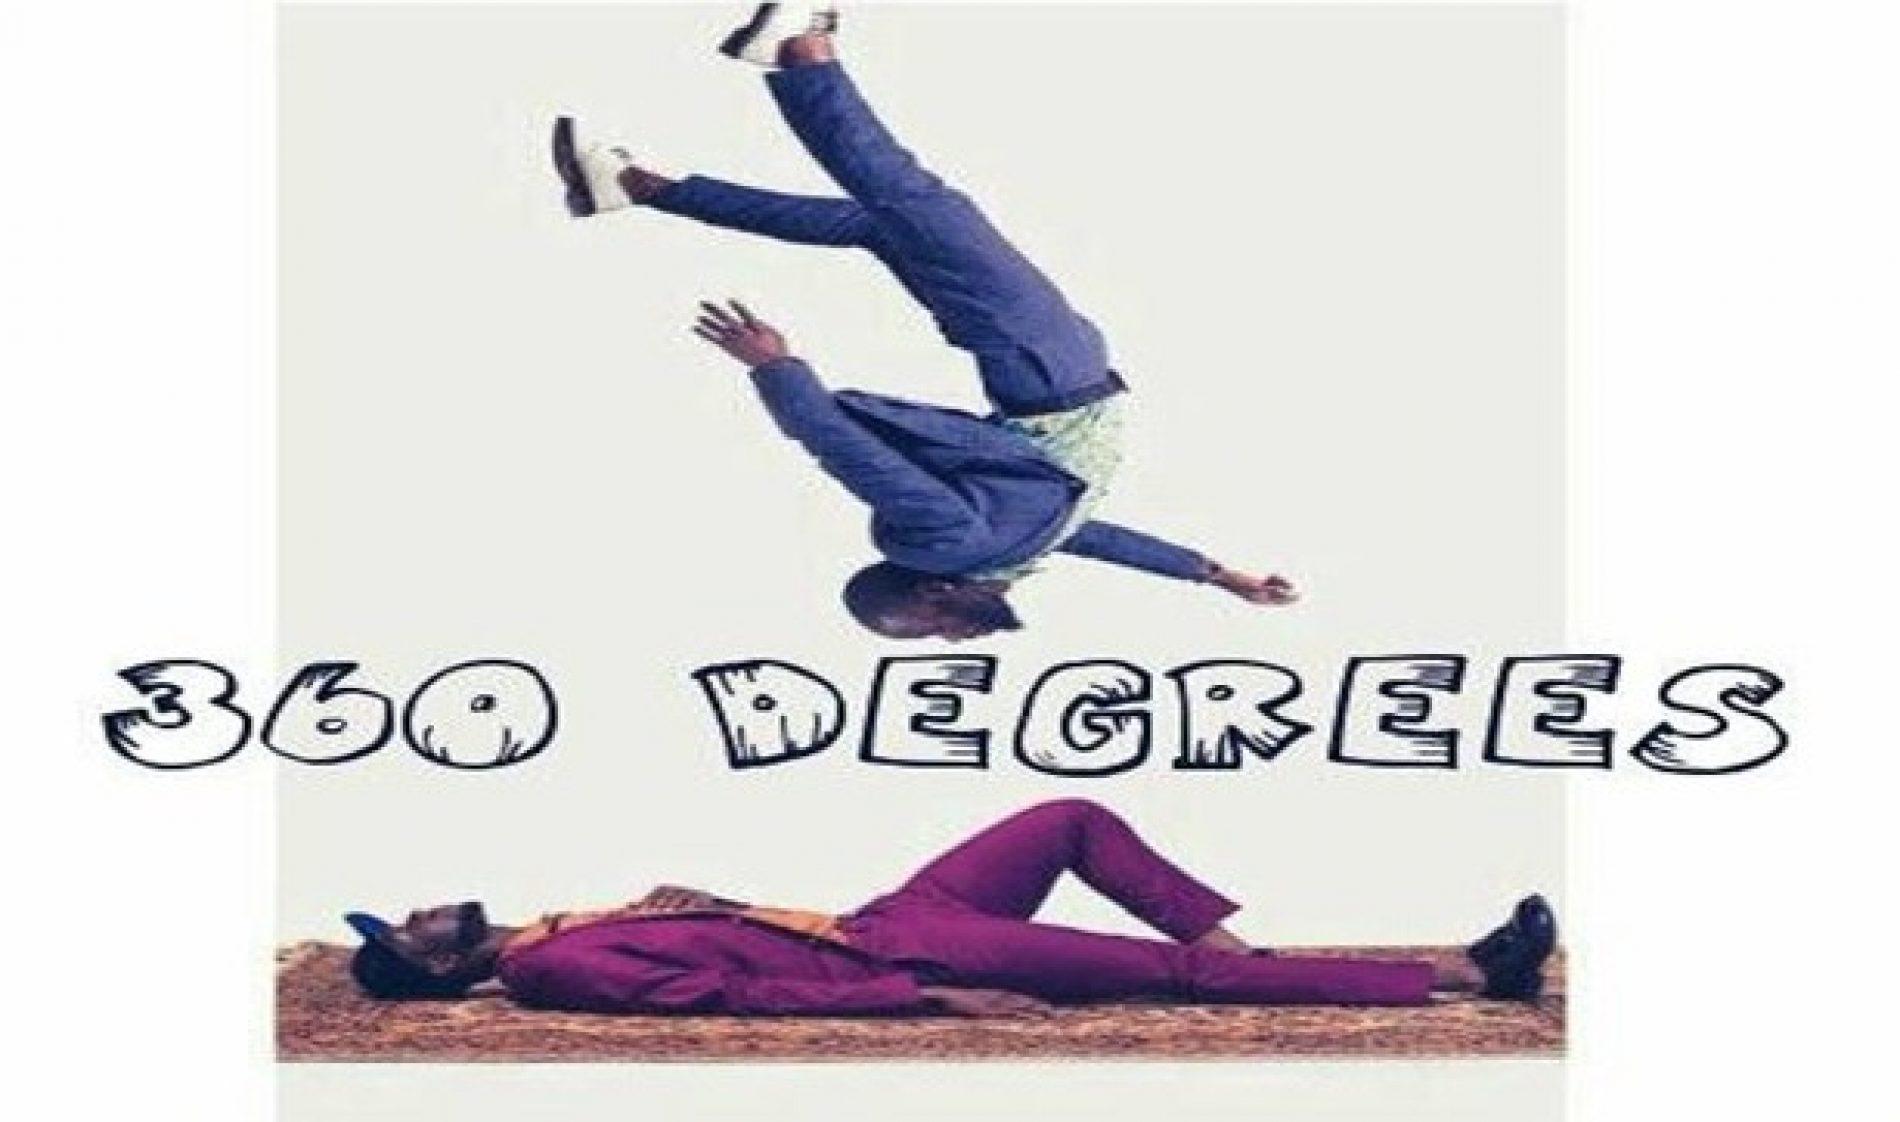 360 Degrees (Part 3)